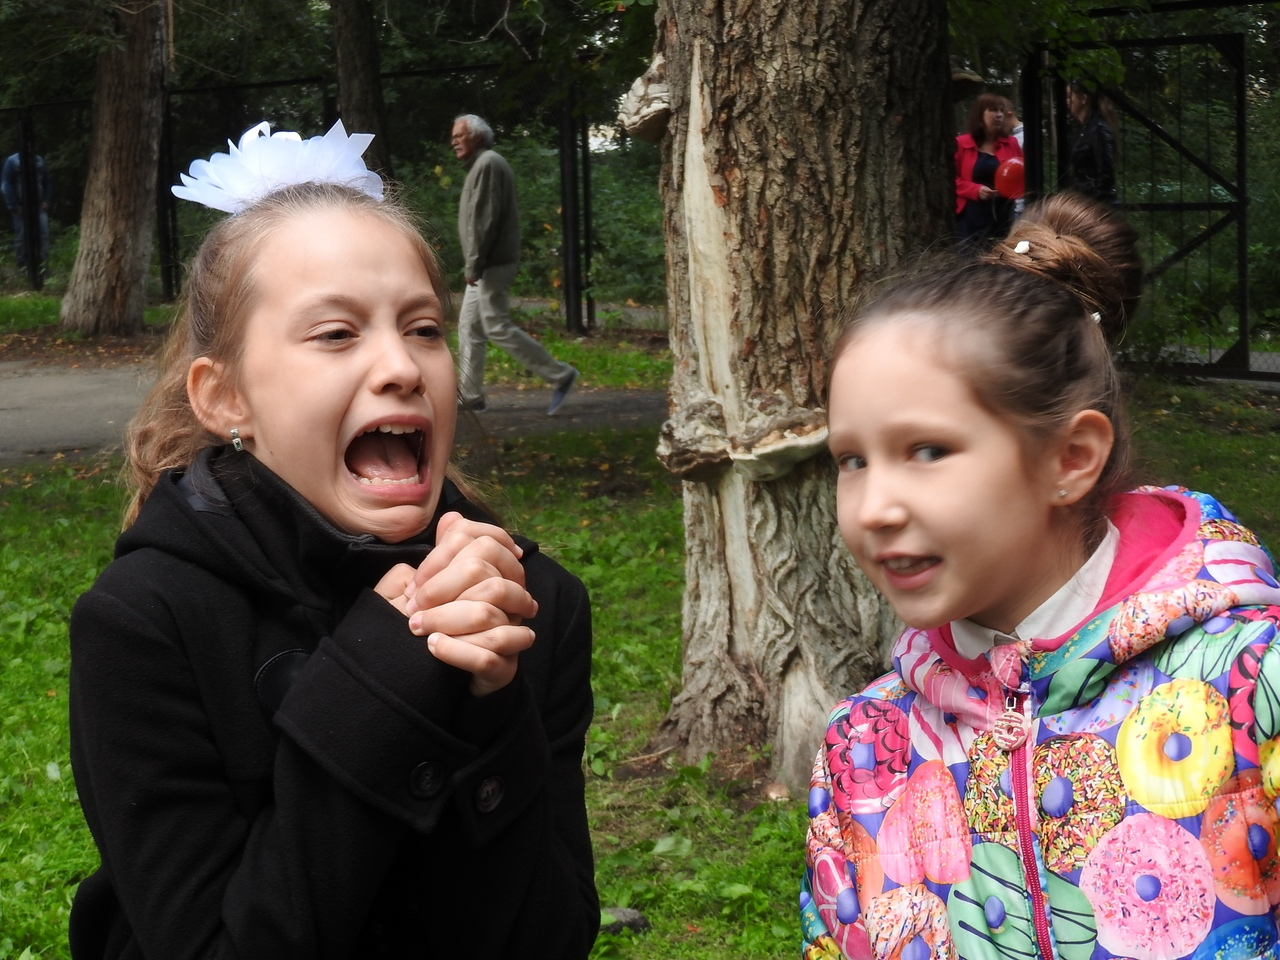 Каникулы кончились... (Маша кашапова 9 лет, Саша Попова 10 лет)